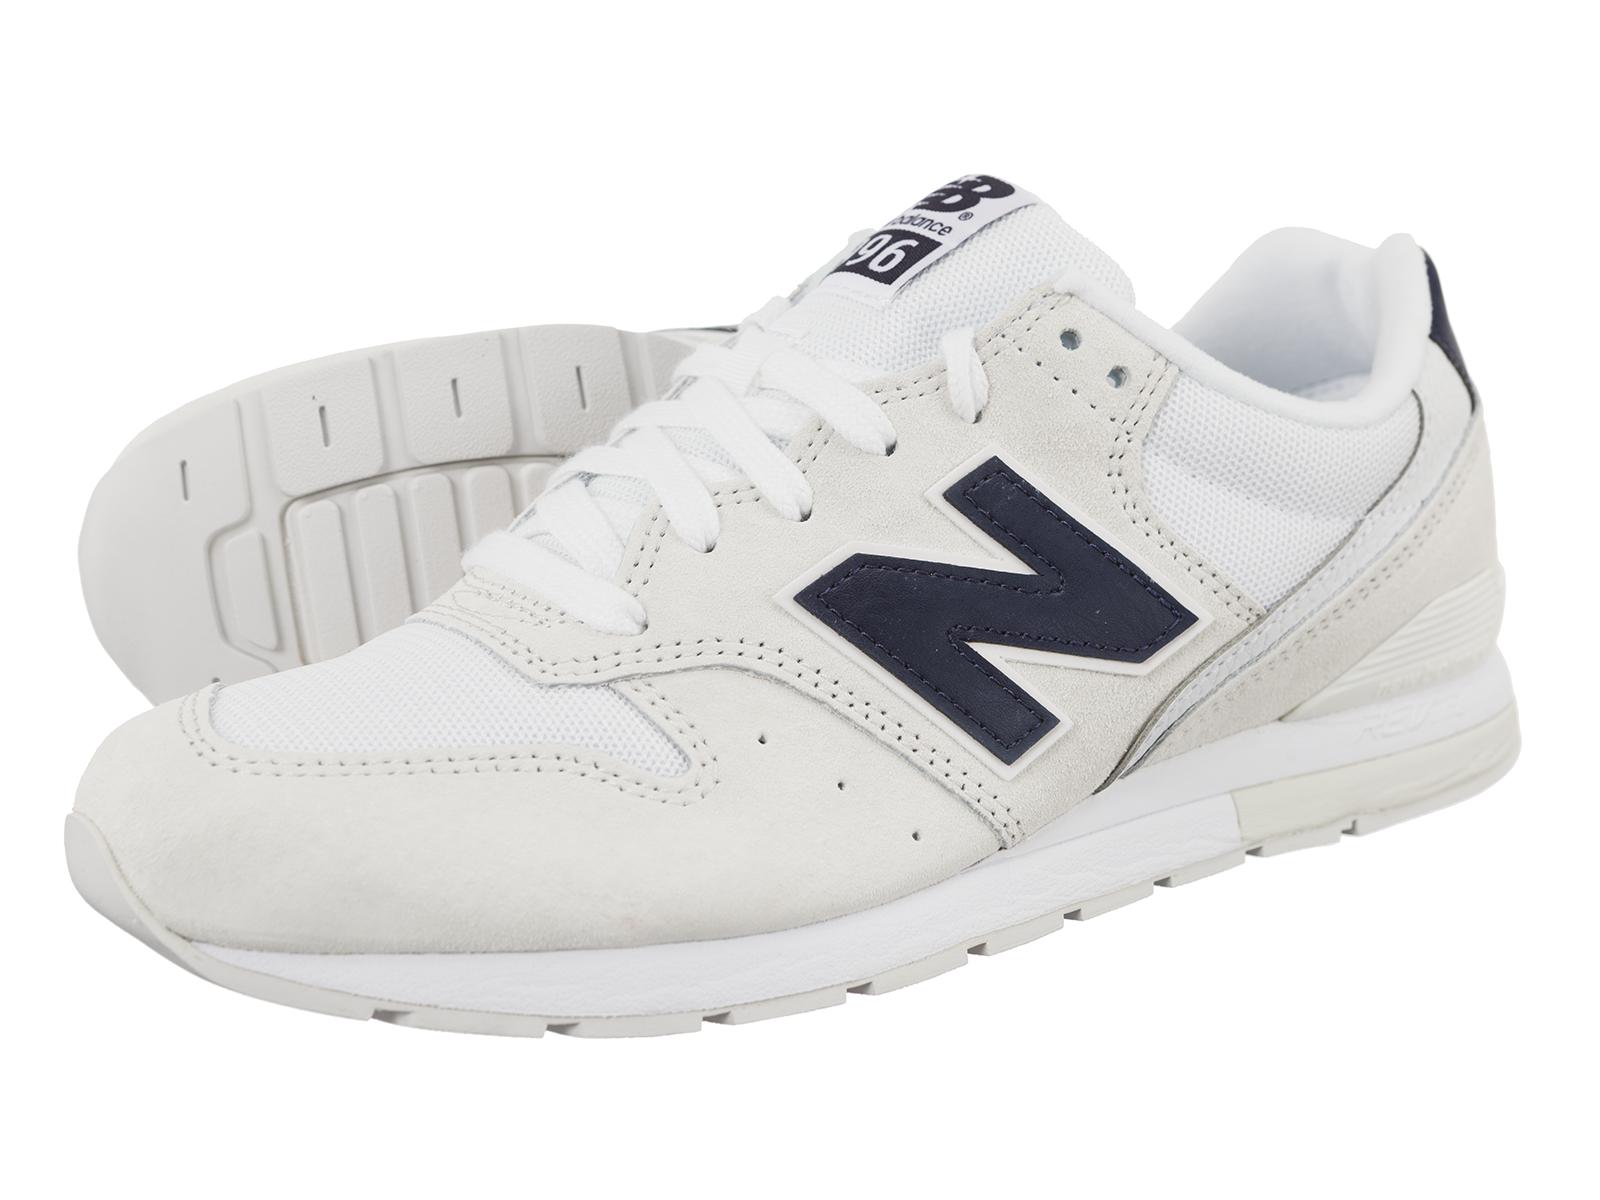 New Balance Unisex Sneakers Scarpe Da Ginnastica Traspiranti Stringate